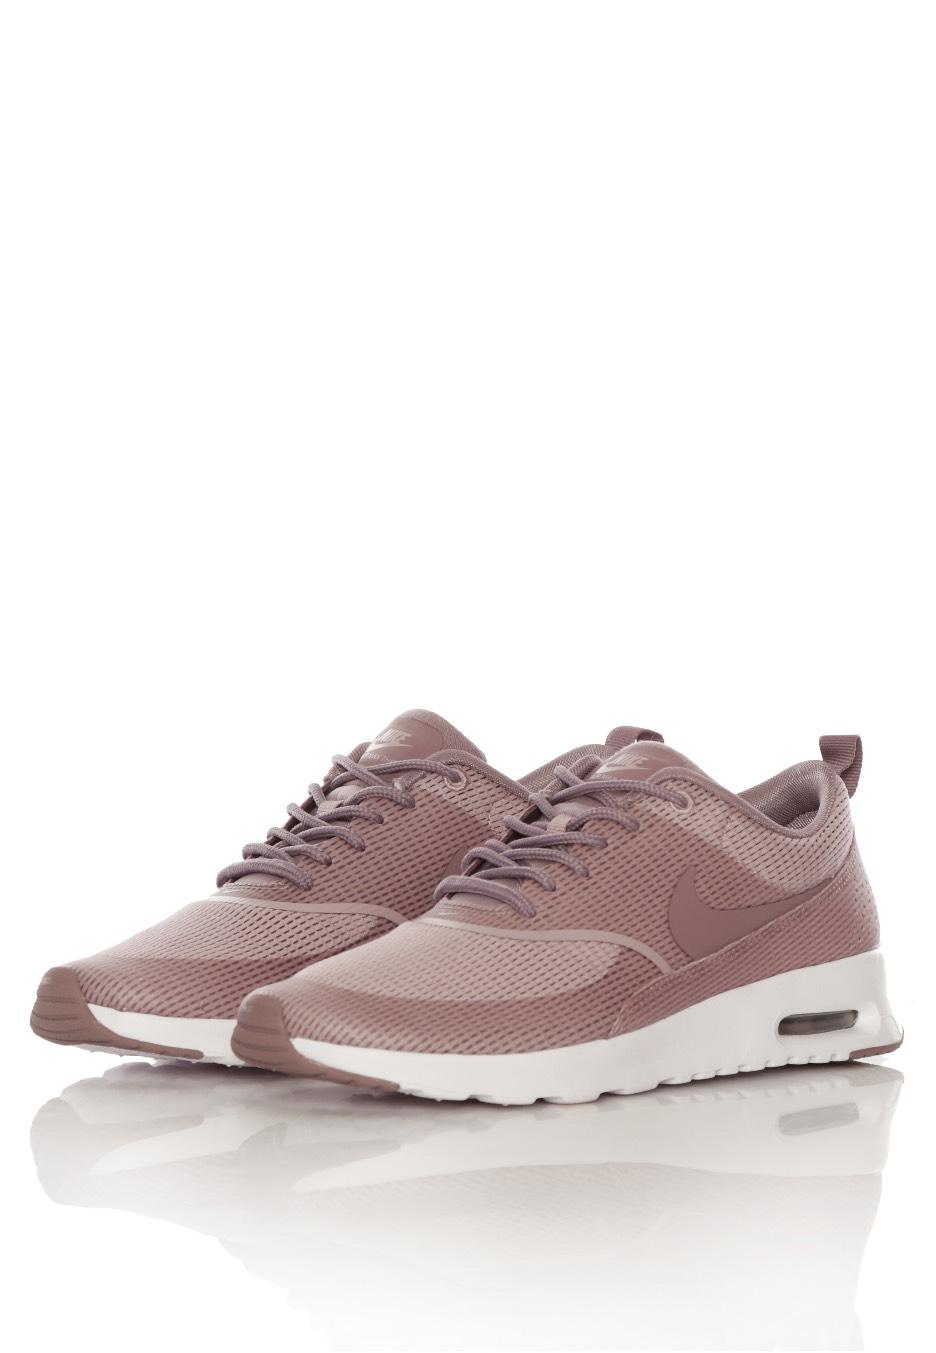 low priced 6b3ce 5604c ... australia nike air max thea textil plum fog purple smog white girl shoes  1a5ab 27750